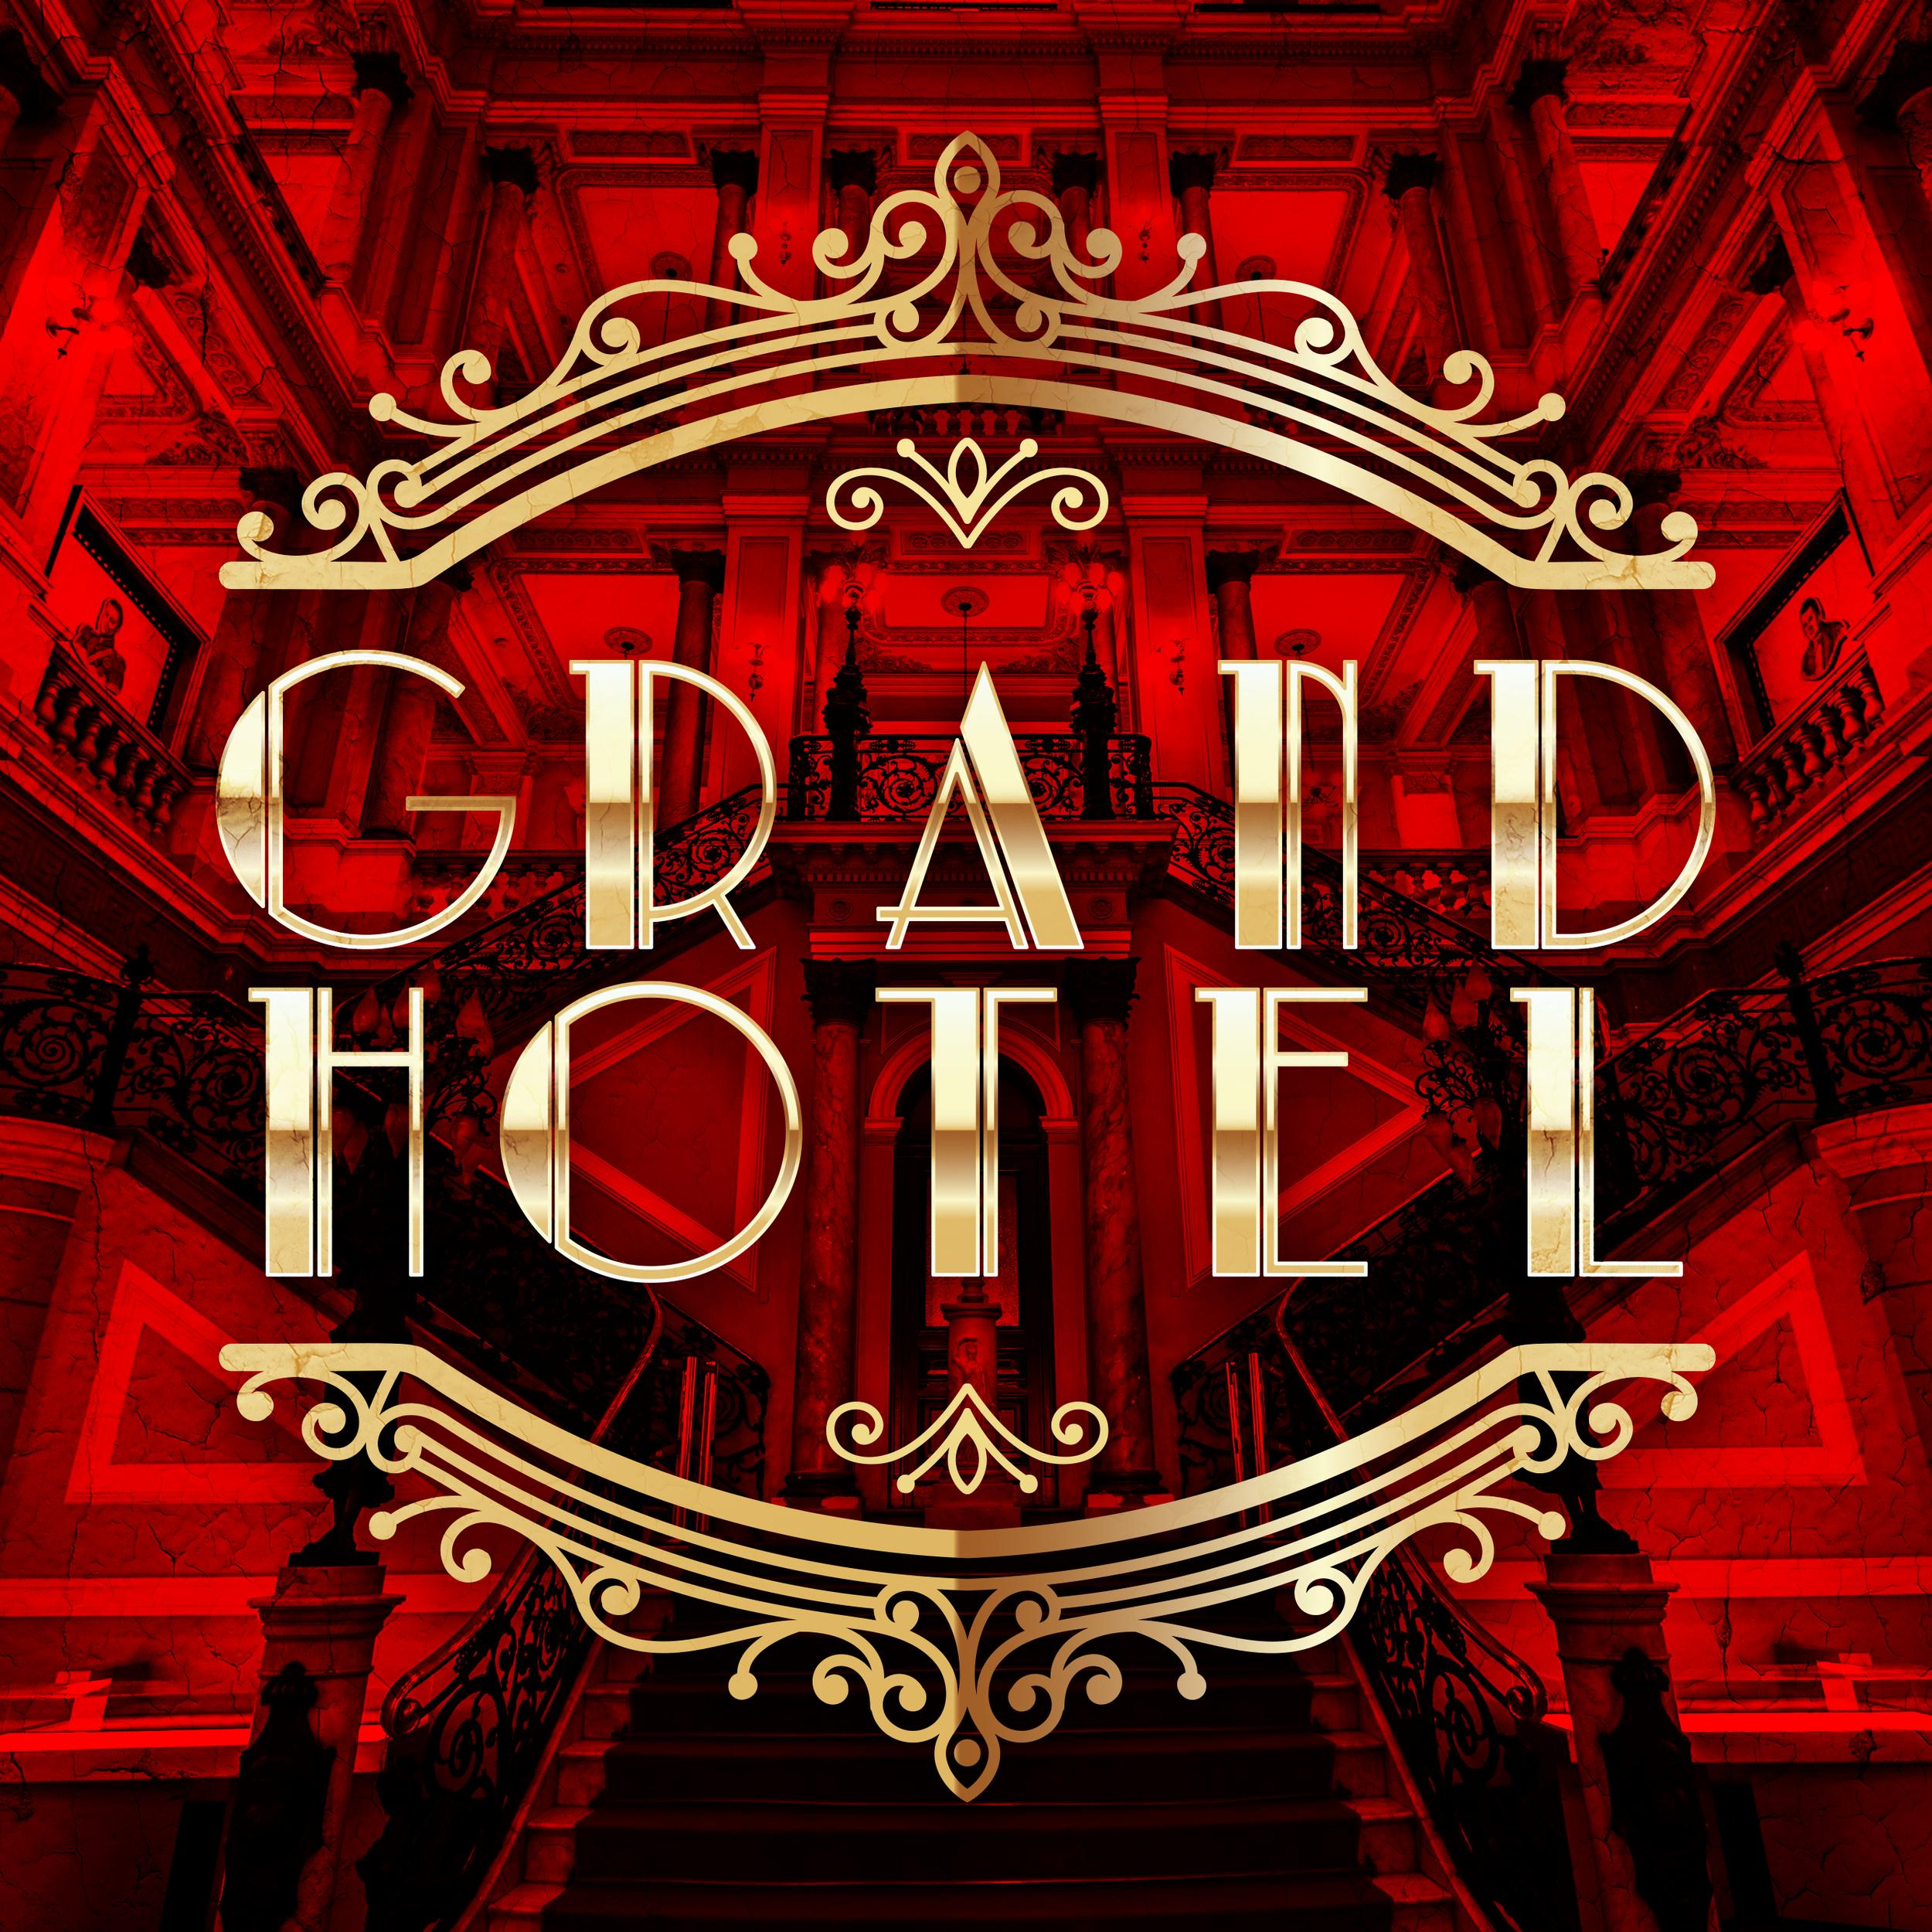 Grand_Hotel_F_b_square.png